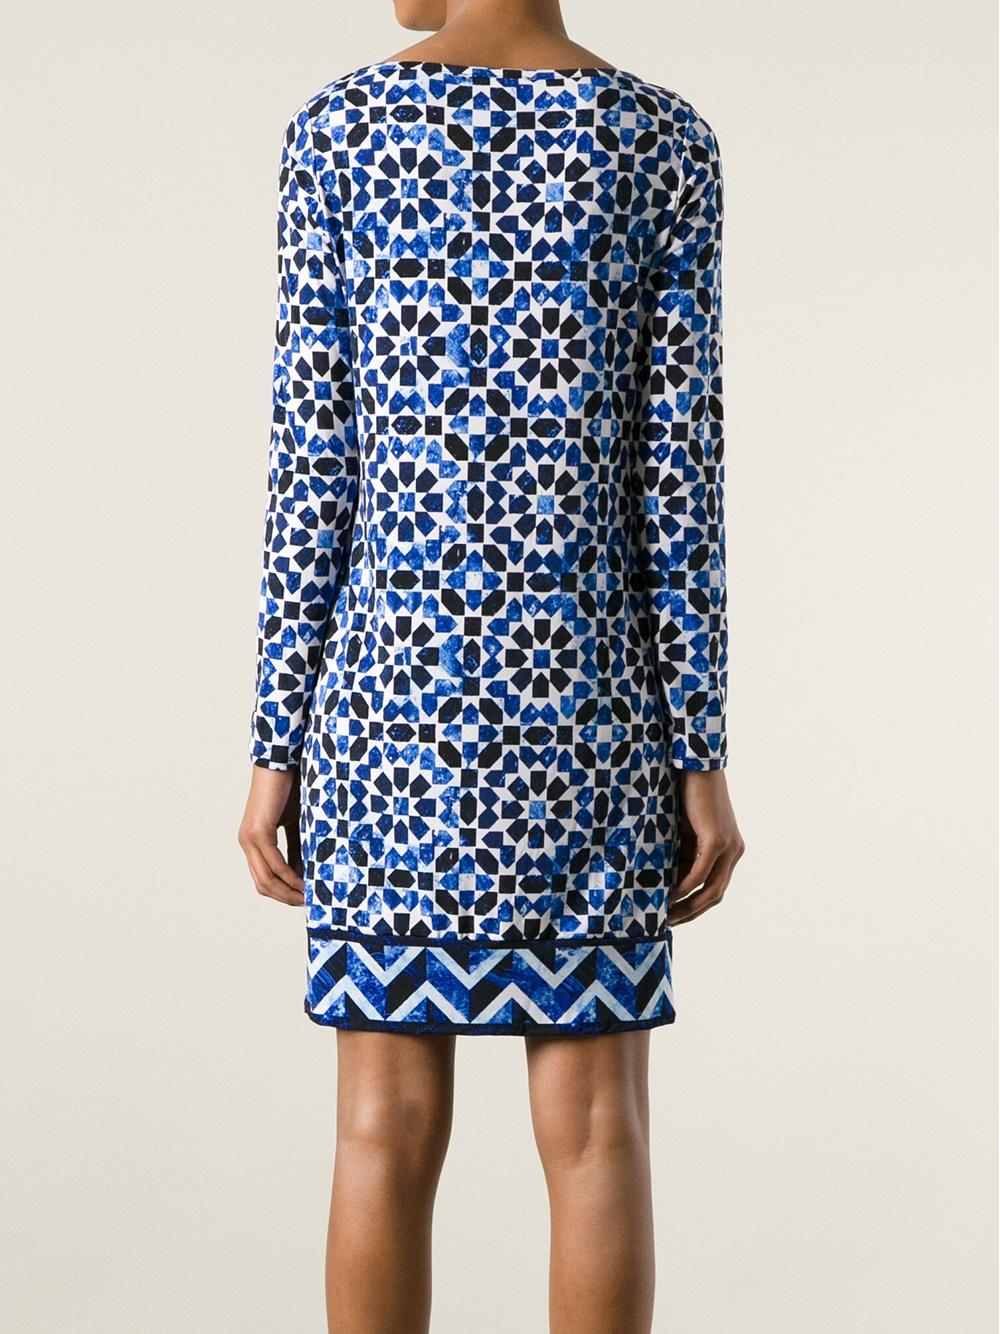 MICHAEL Michael Kors Geometric Print Shift Dress in Blue